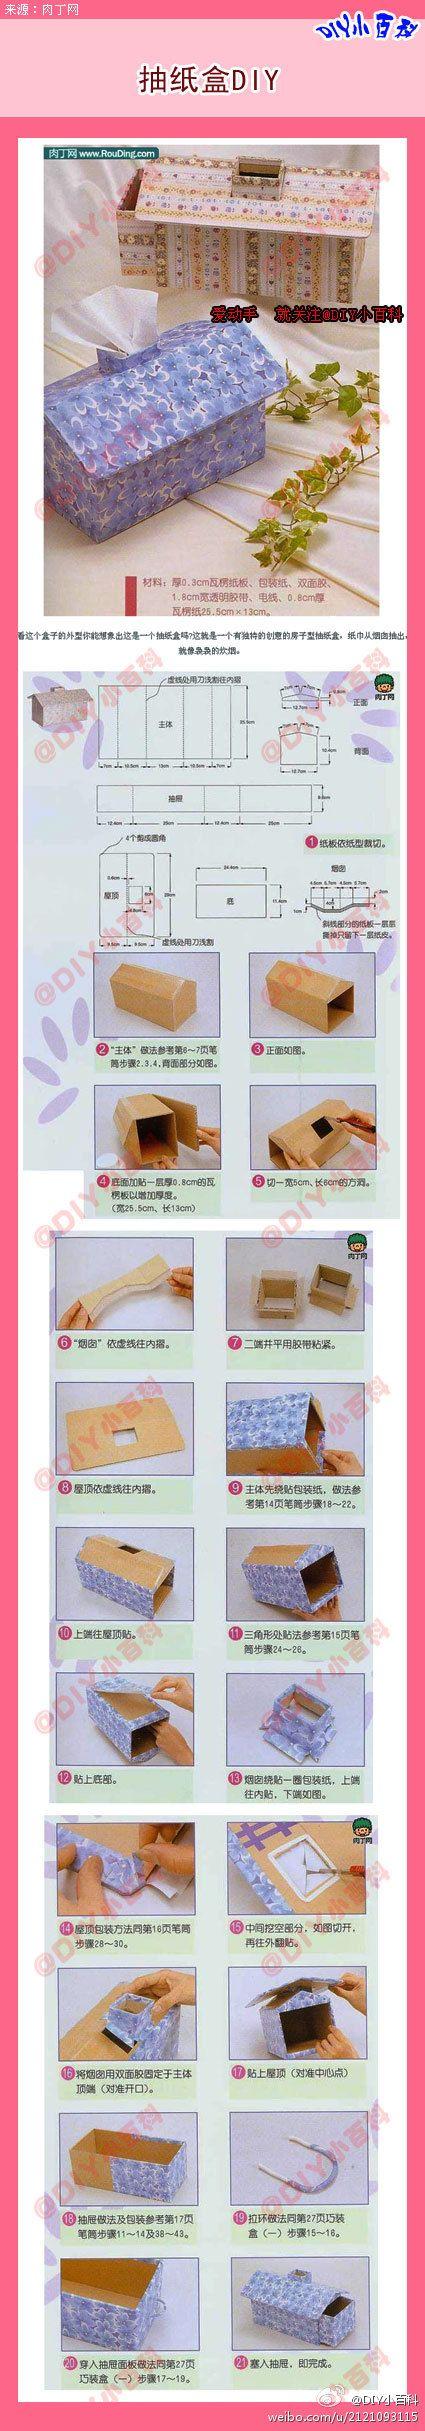 DIY house tissue box